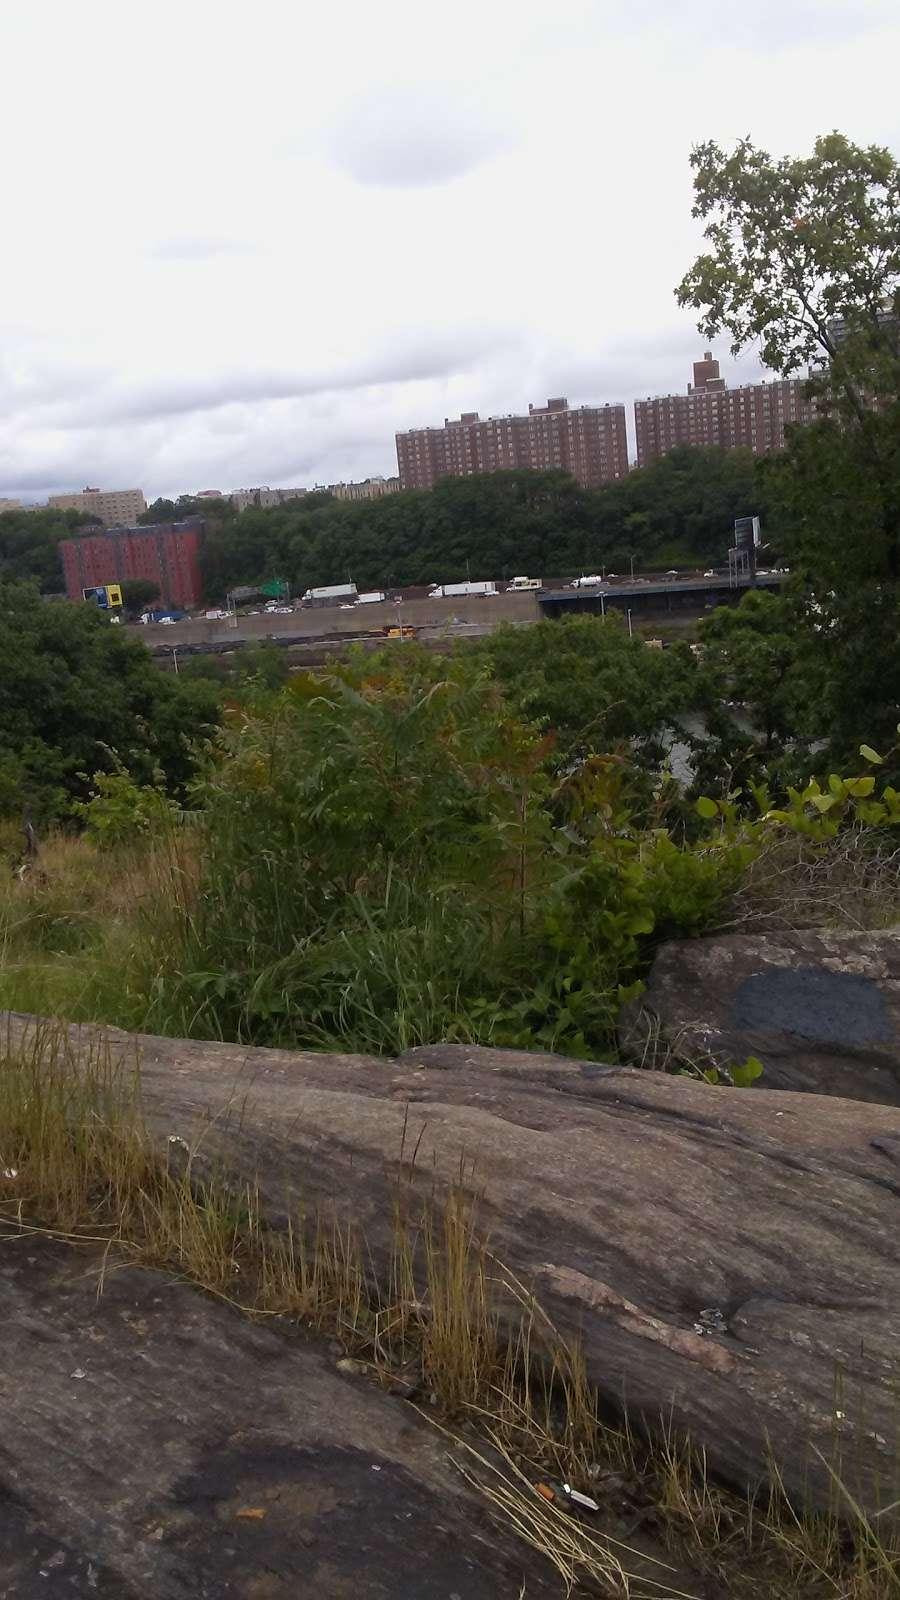 Metro North Railroad - Highbridge Yard - train station  | Photo 9 of 10 | Address: Depot Pl, Bronx, NY 10452, USA | Phone: (212) 532-4900